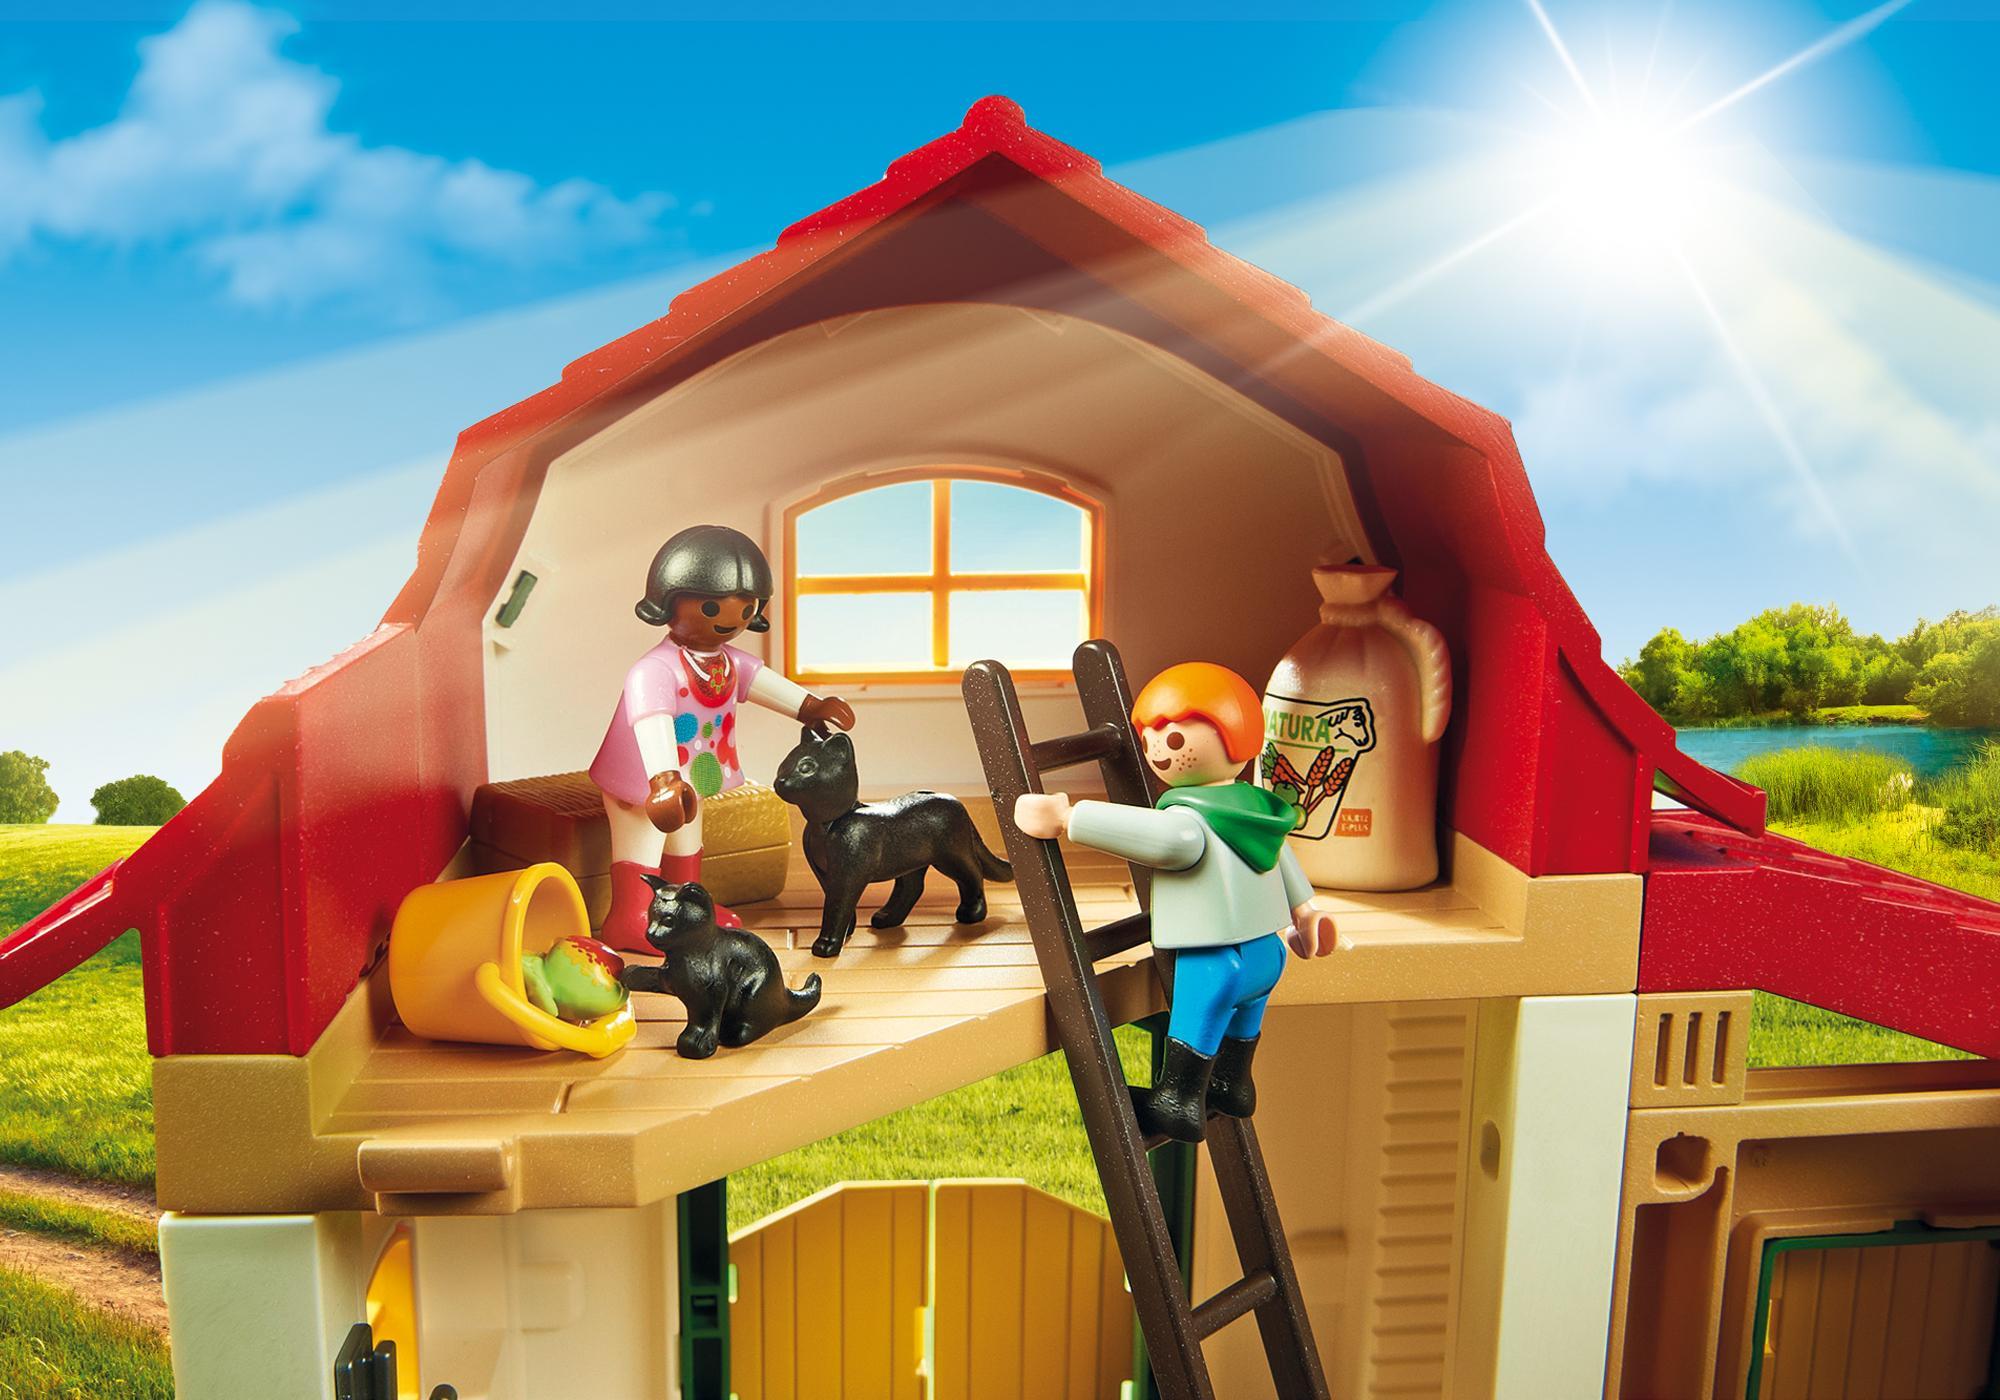 http://media.playmobil.com/i/playmobil/6927_product_extra1/Pony Farm